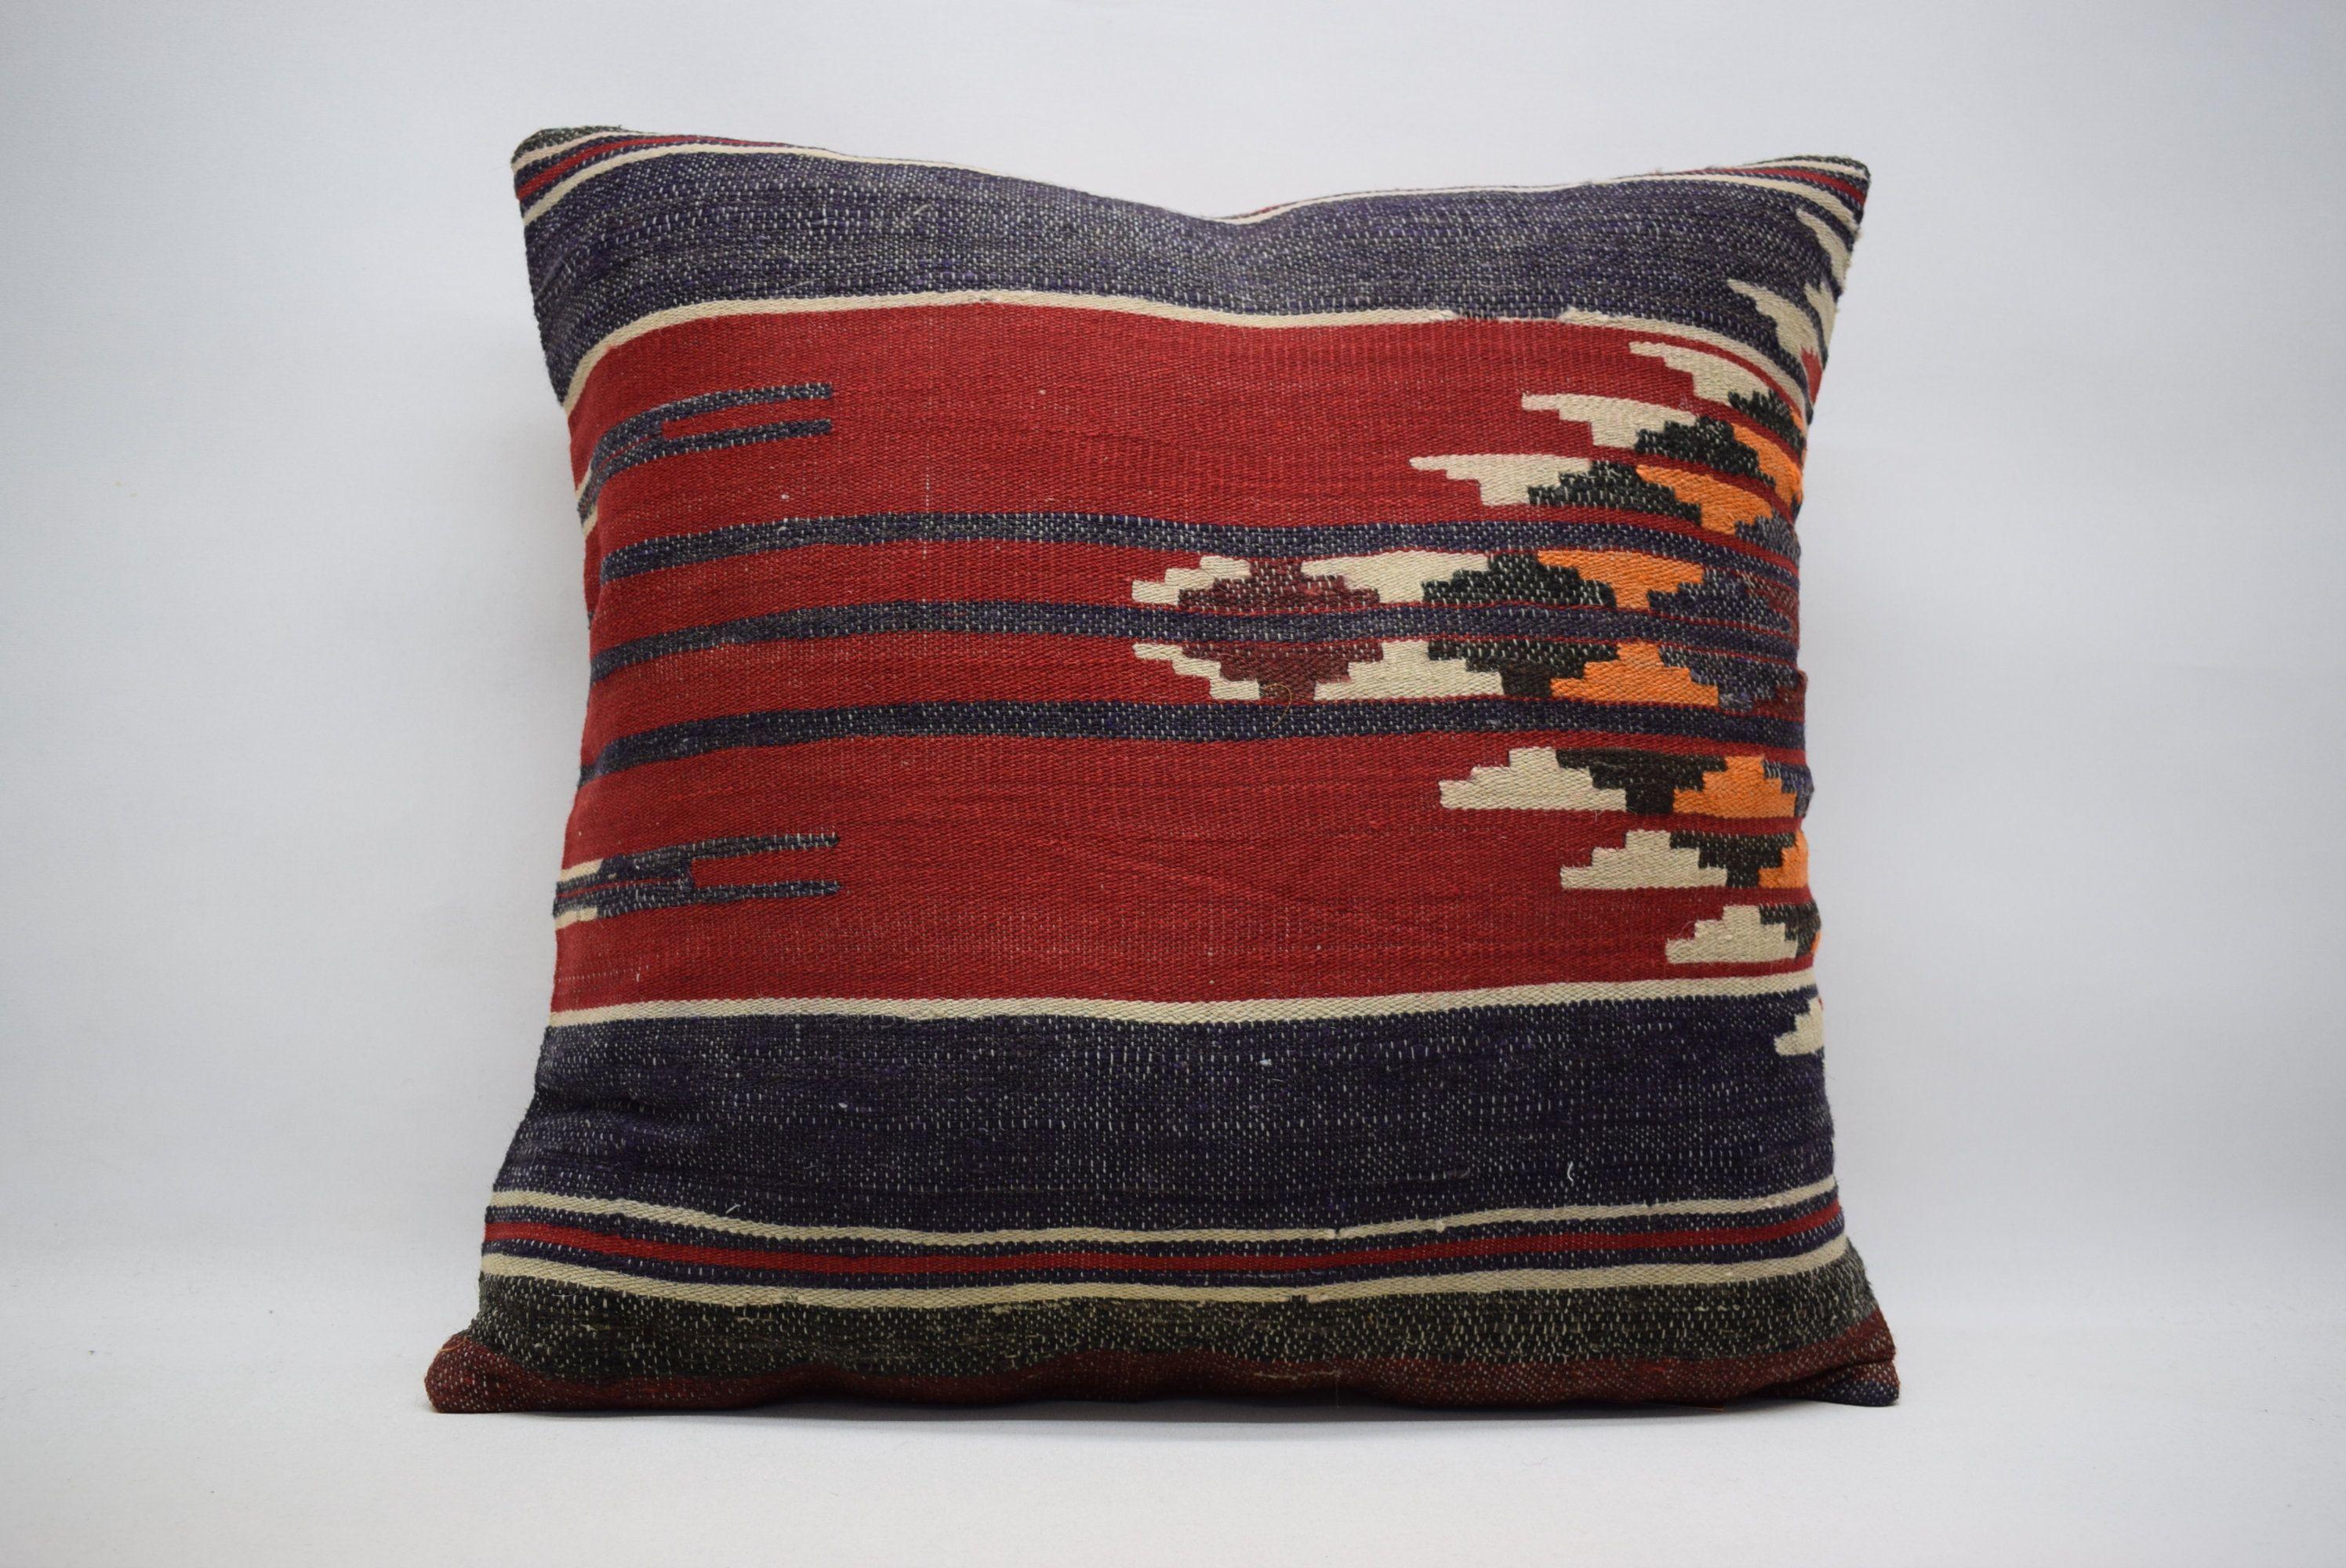 naturel pillow / floor pillow / decorative kilim pillow / 24x24 boho pillow  / home decor kelim cushion / kilim pillows / wool pillow 0725